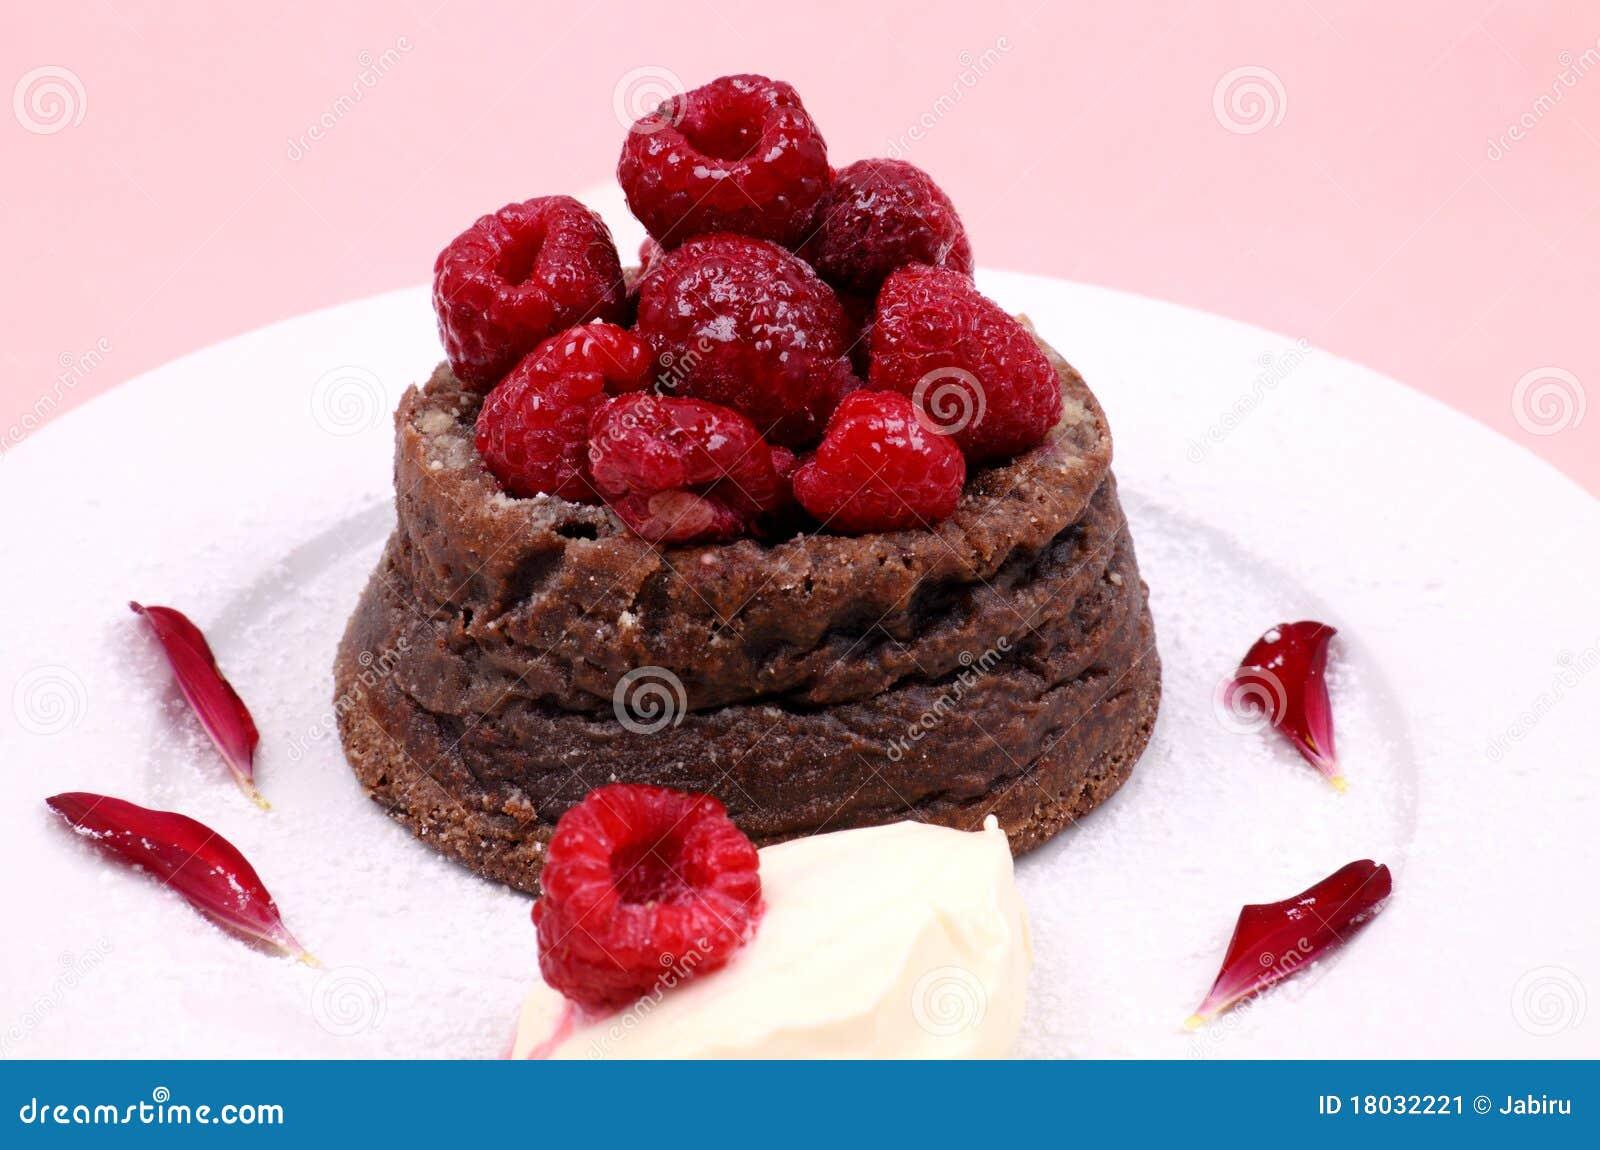 Raspberry Chocolate Dessert Stock Image Image 18032221